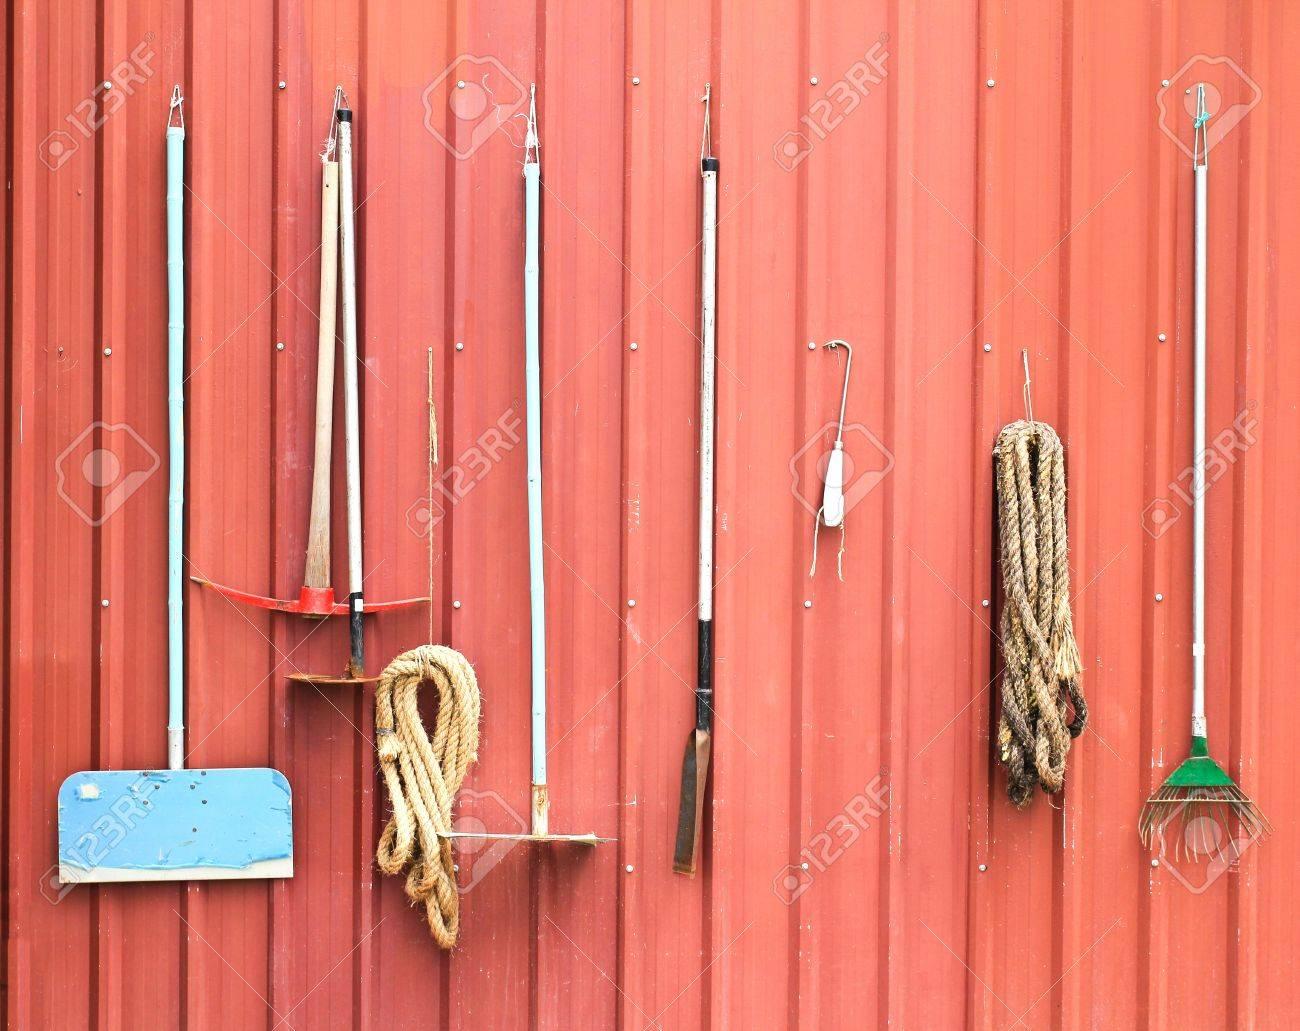 Farm tools hang on red barn wall Stock Photo - 21796861